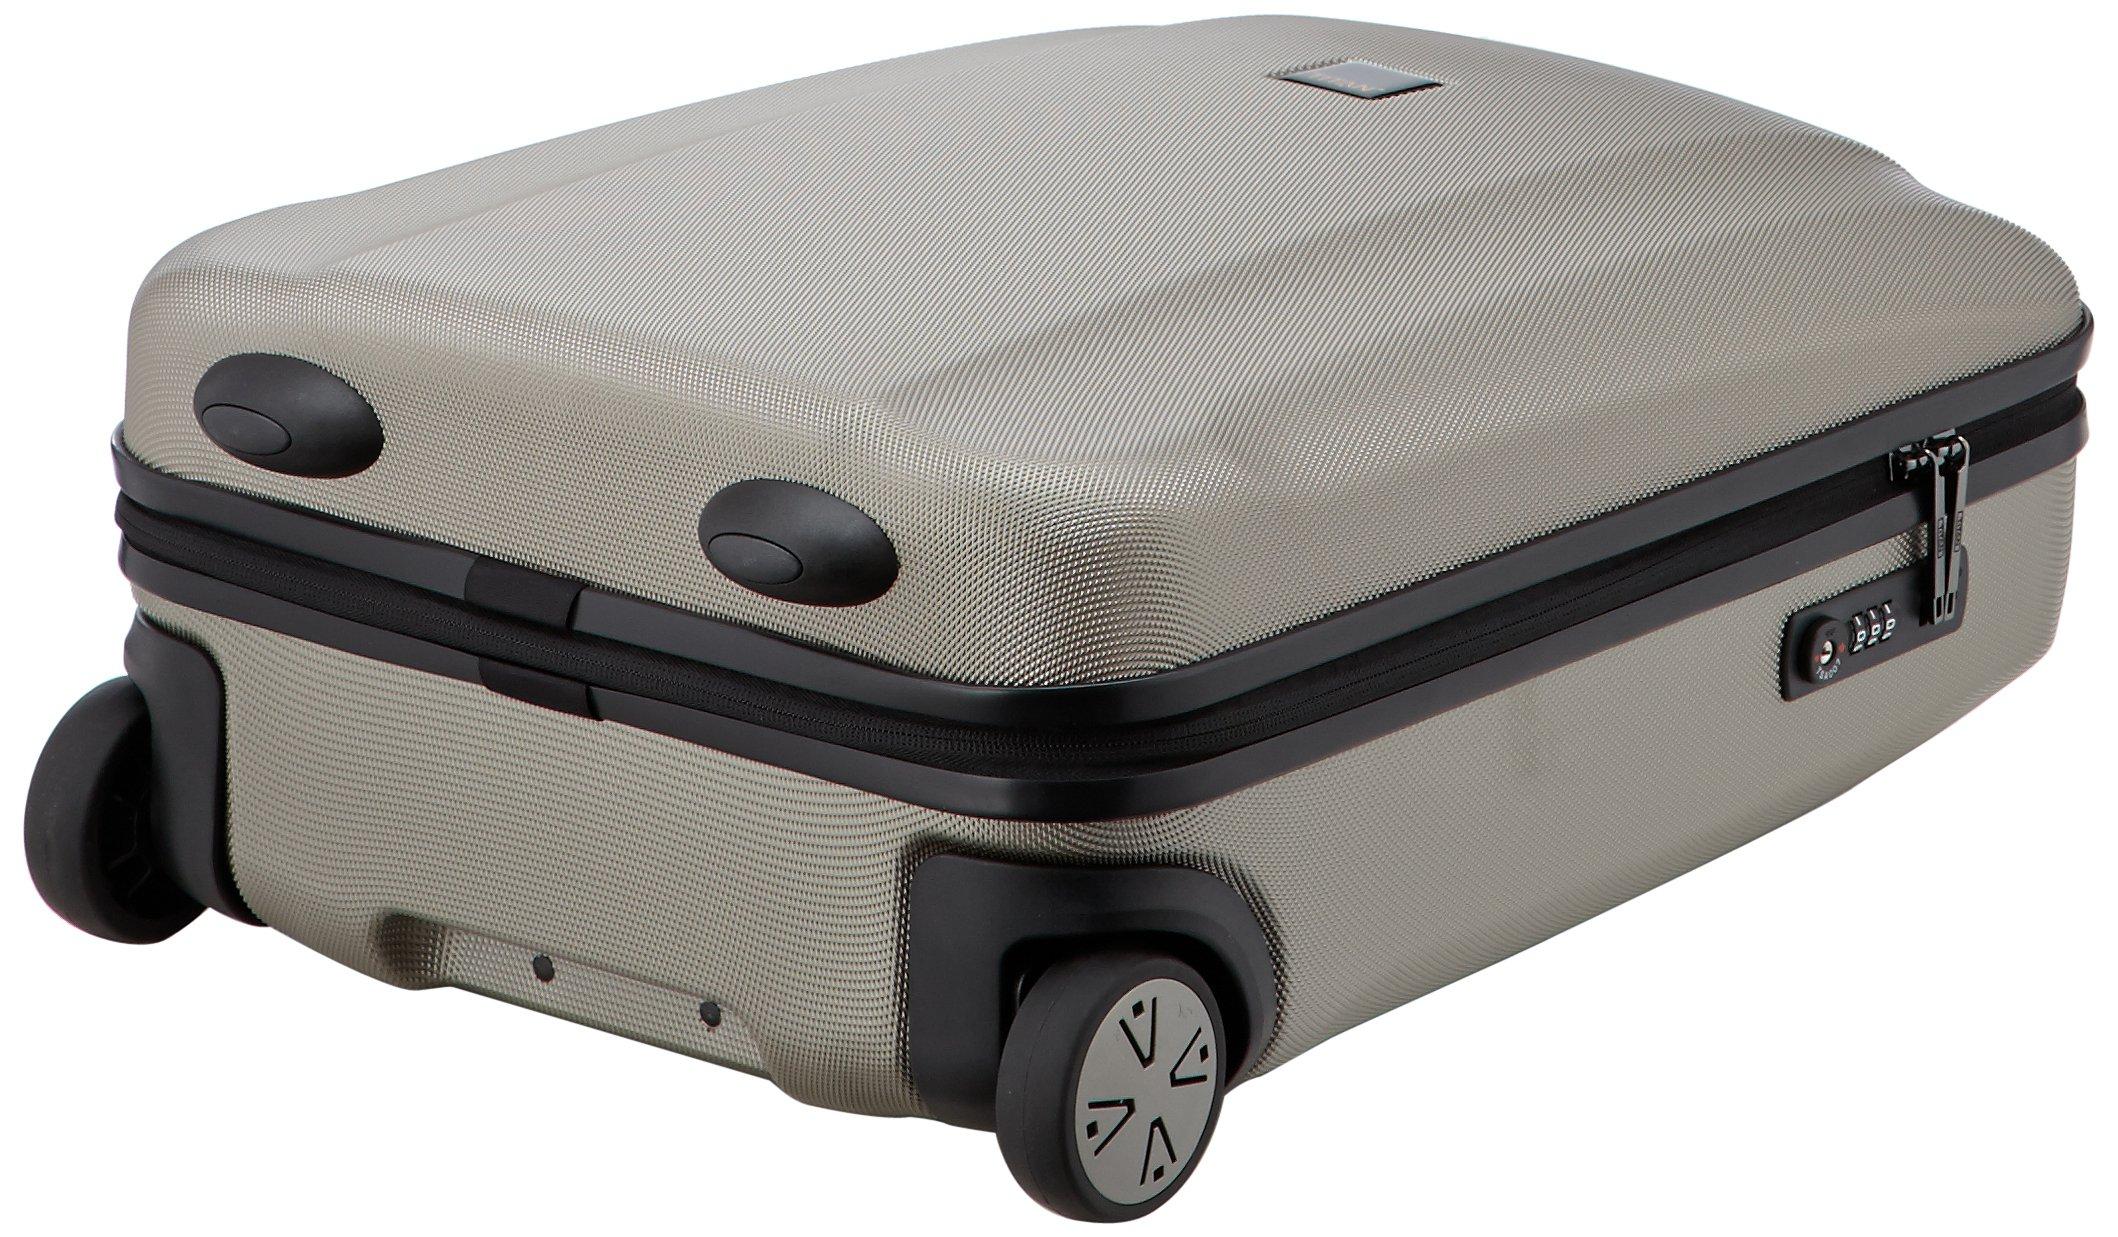 TITAN-Koffer-Xenon-2-Rad-Bordgepcktrolley